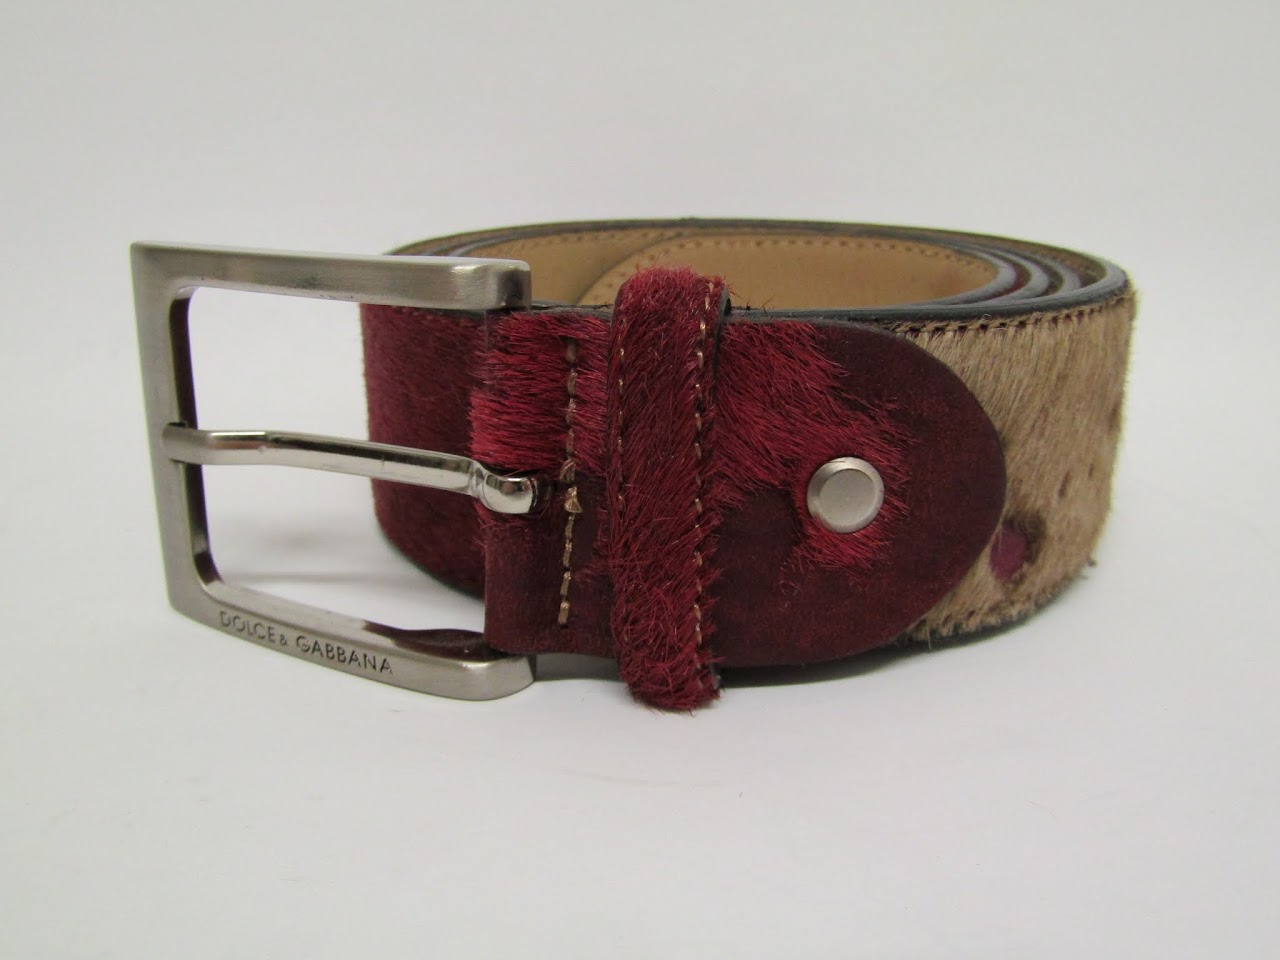 Dolce & Gabbana Hide Belt